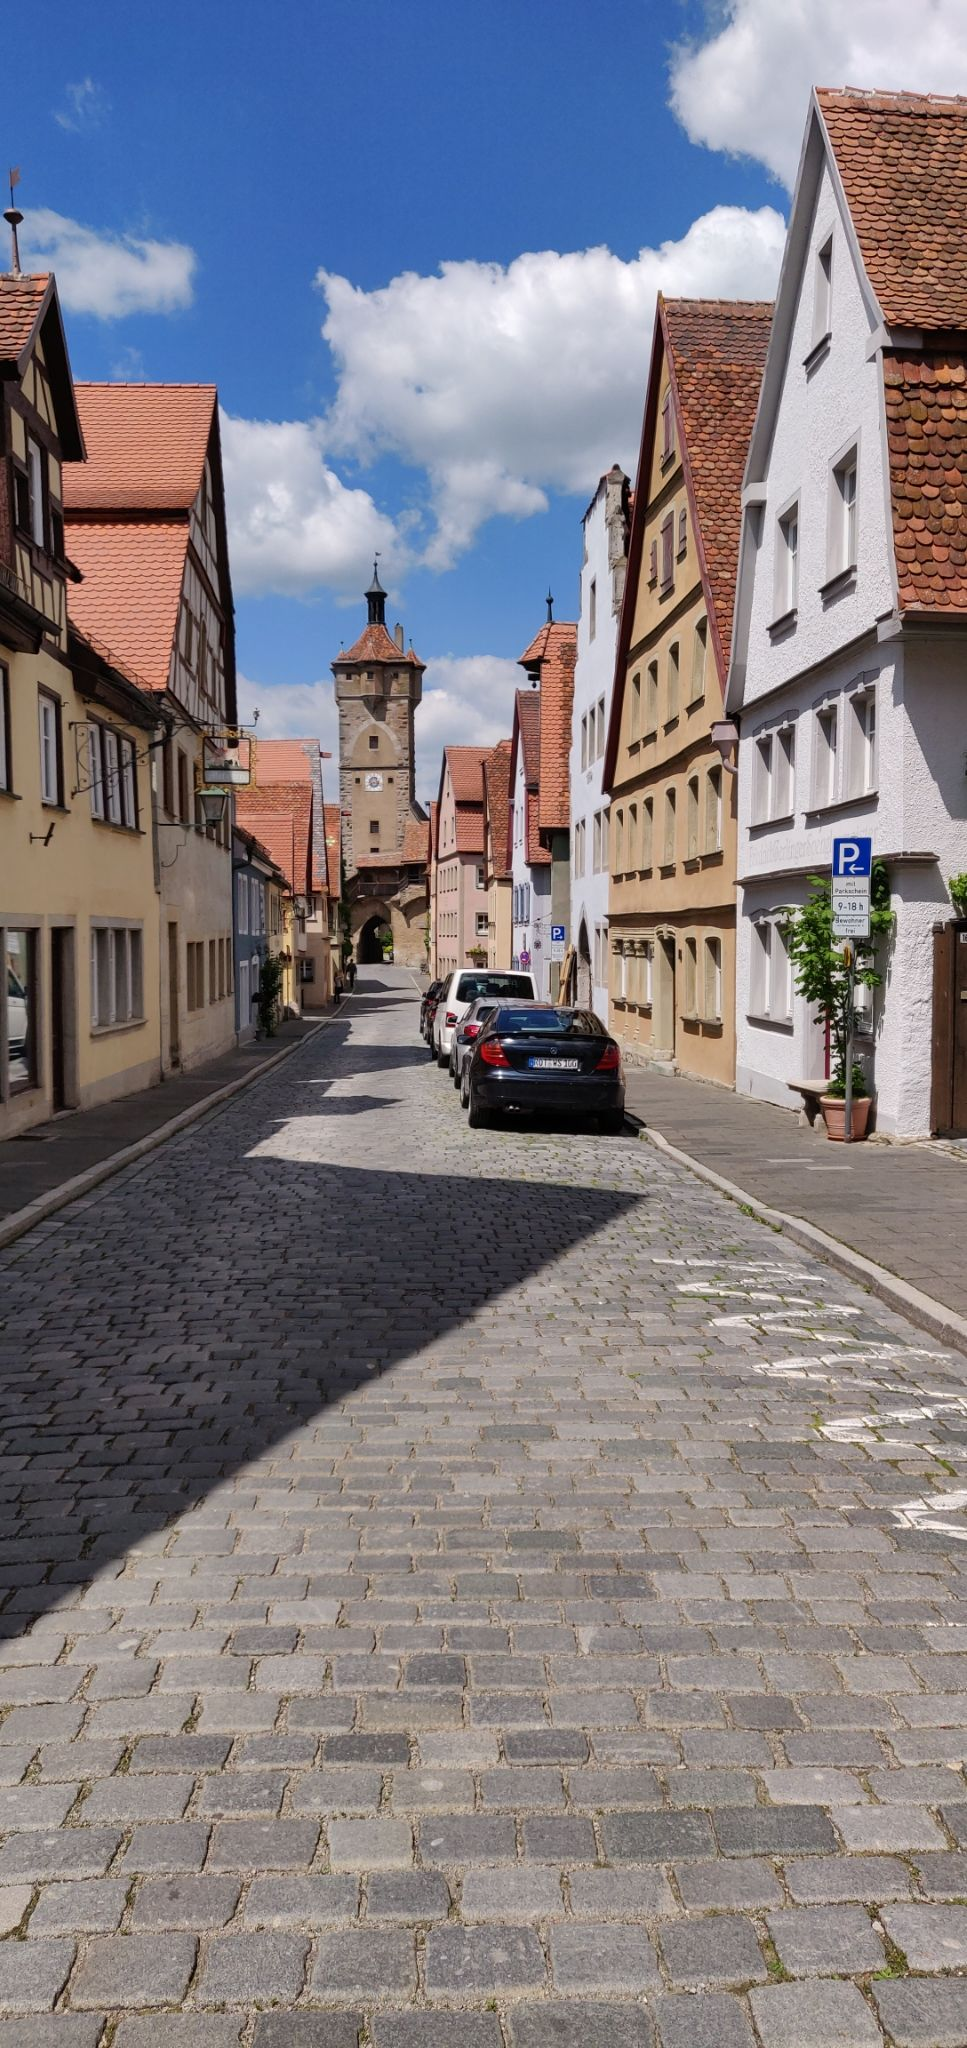 Photo of Rothenburg ob der Tauber By Arabind